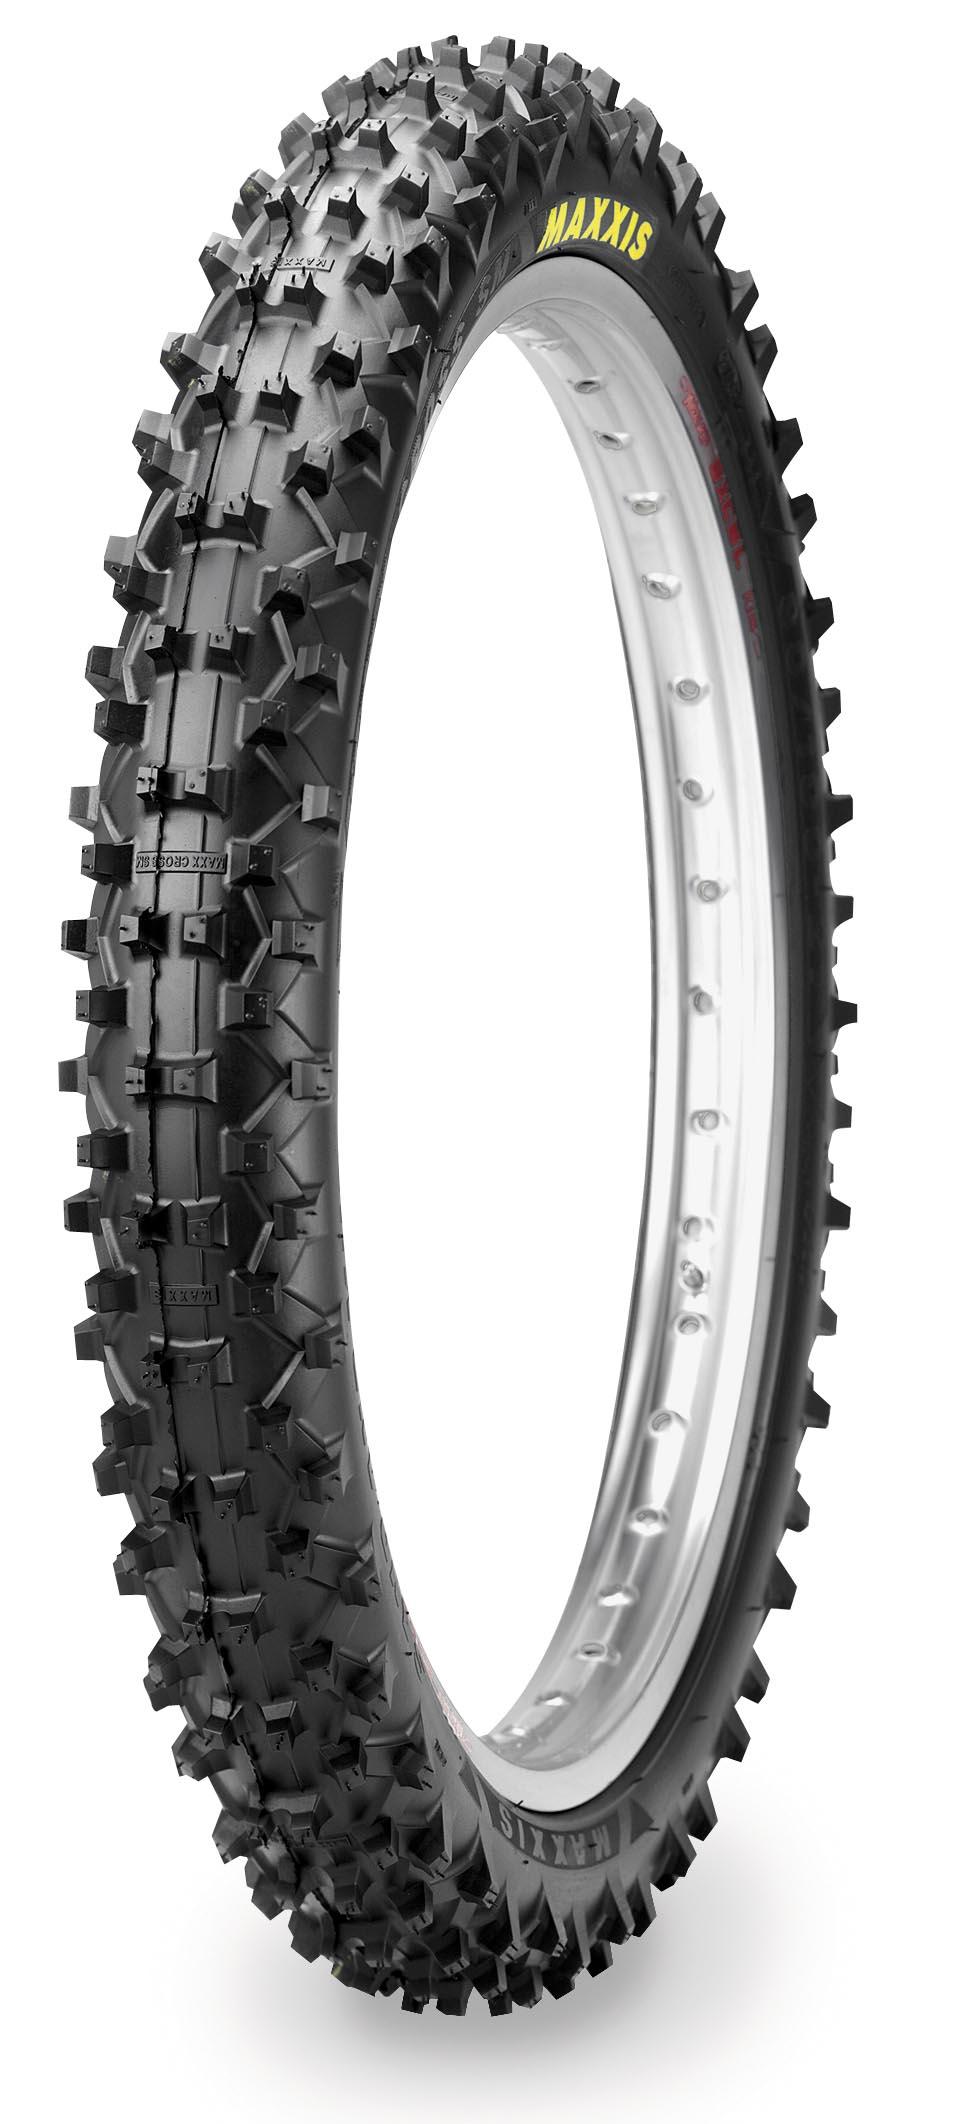 Maxxis M7307 Maxxcross SM Tire